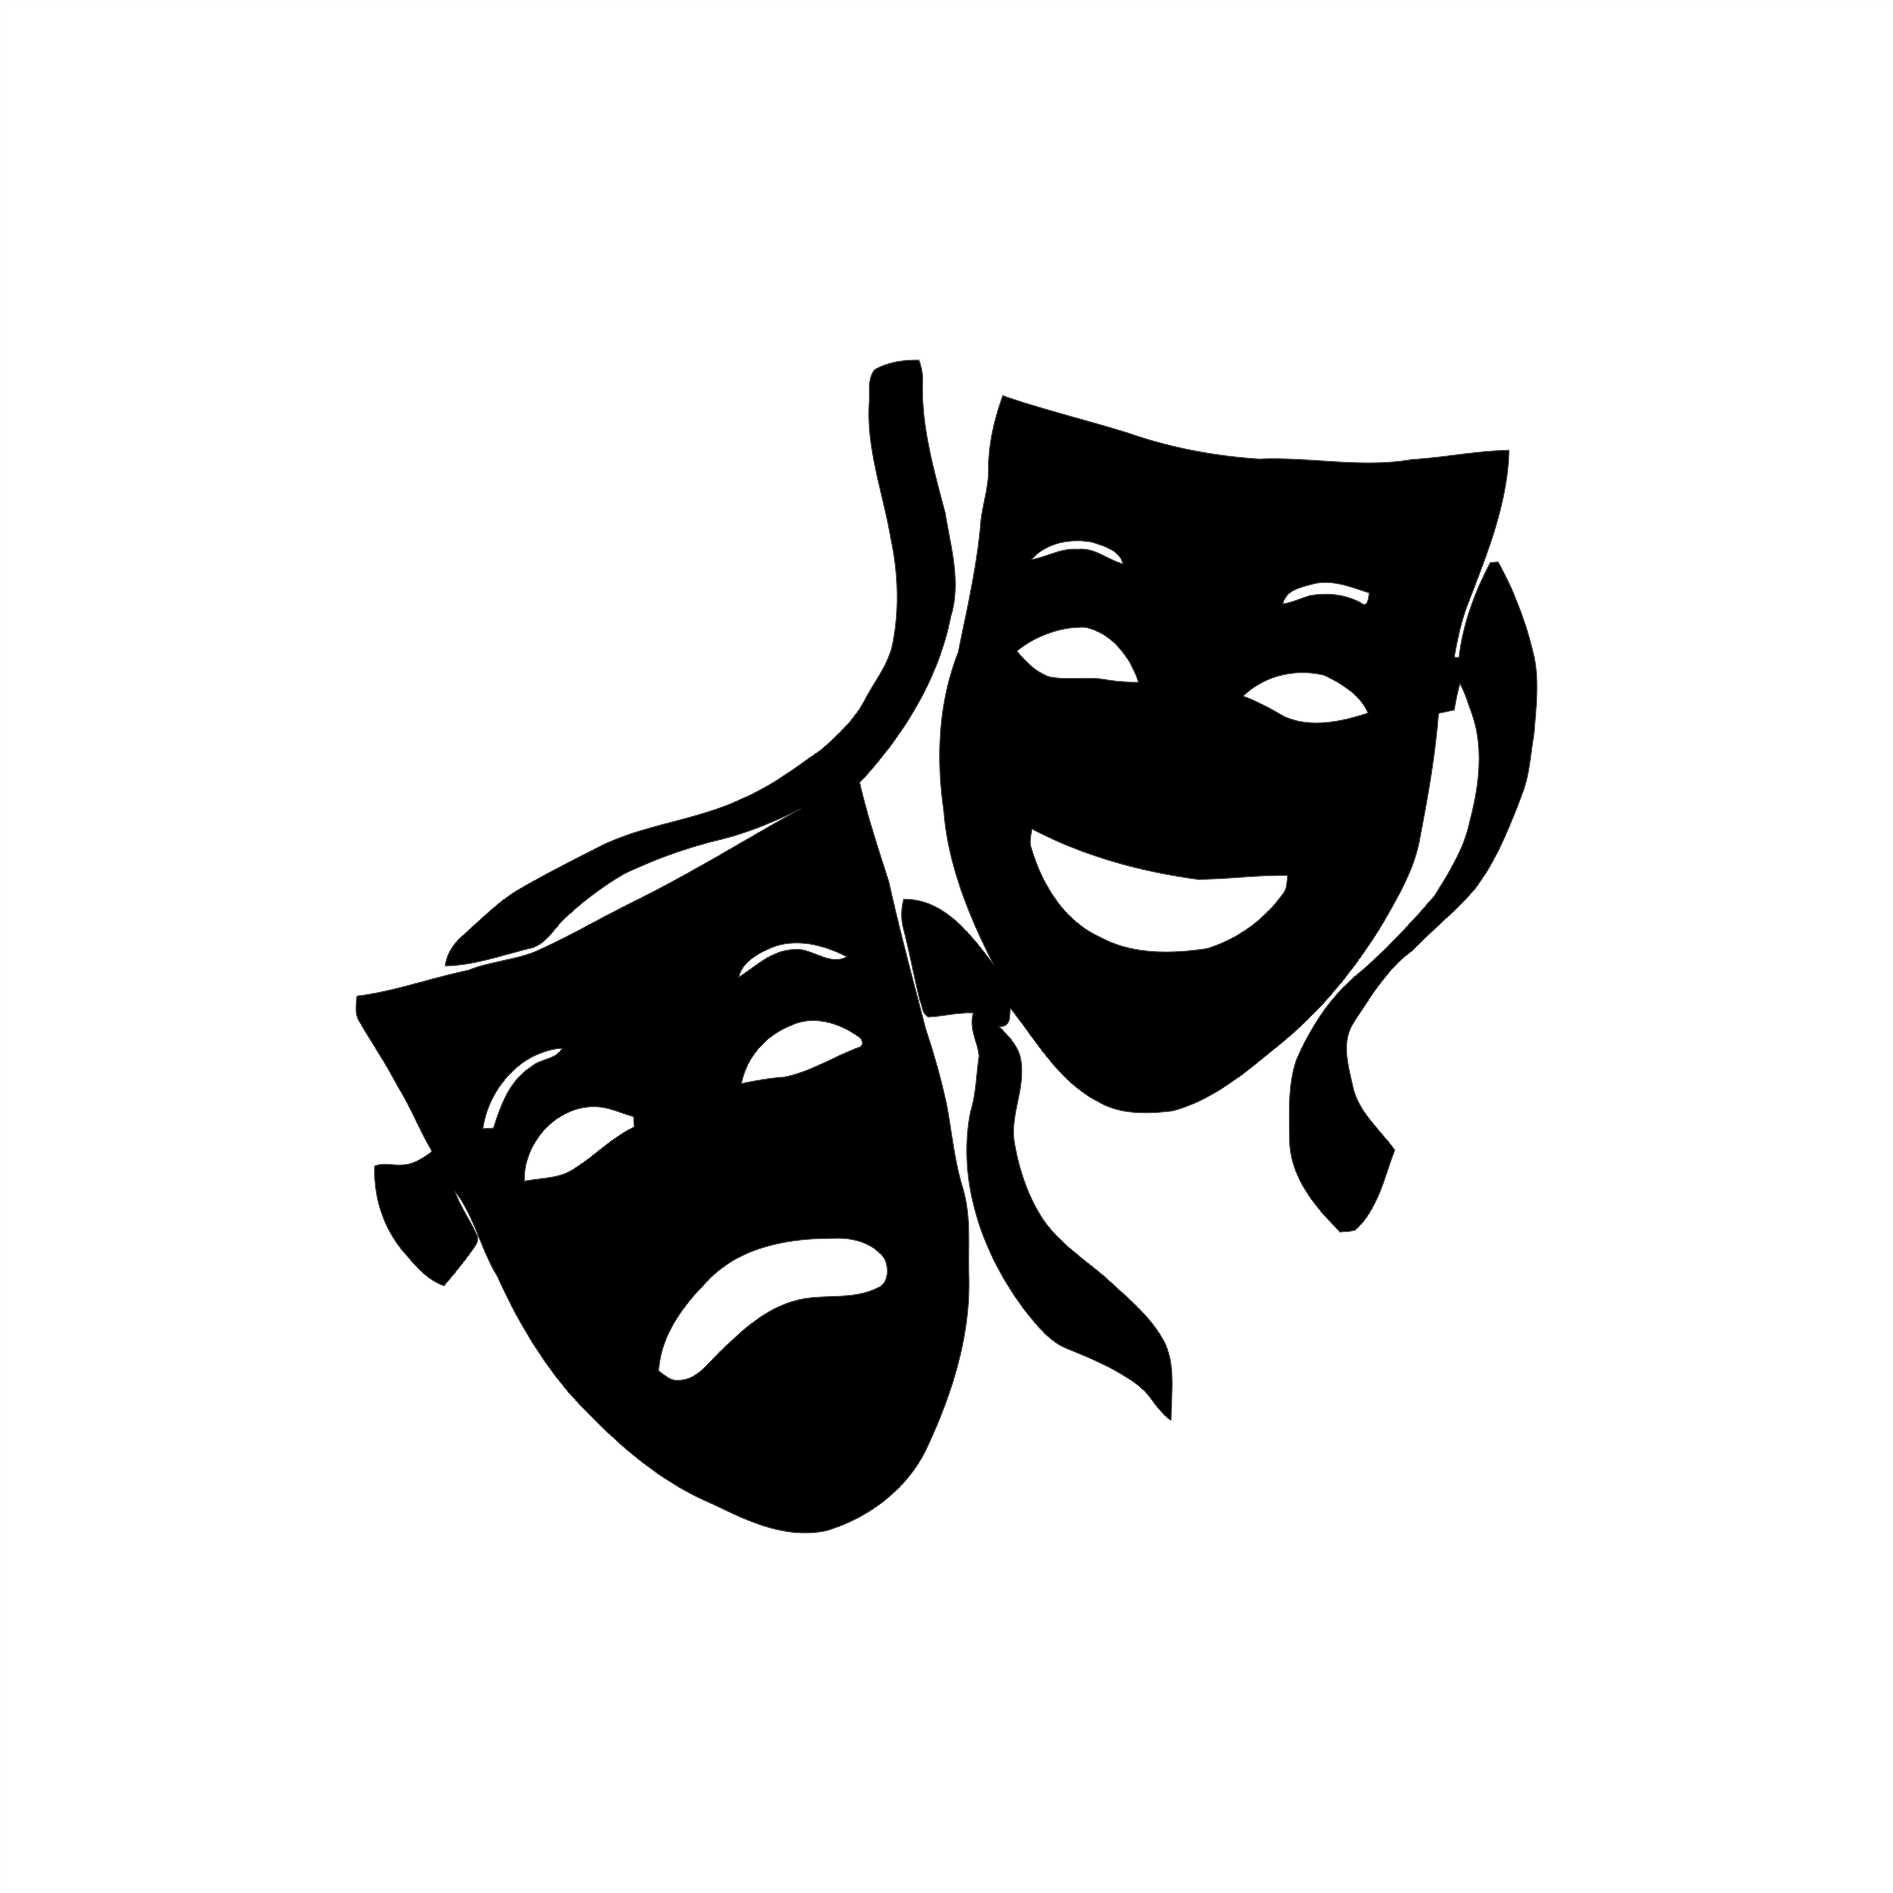 adesivo mascara teatro c234nico 10x10cm queen ind218stria de